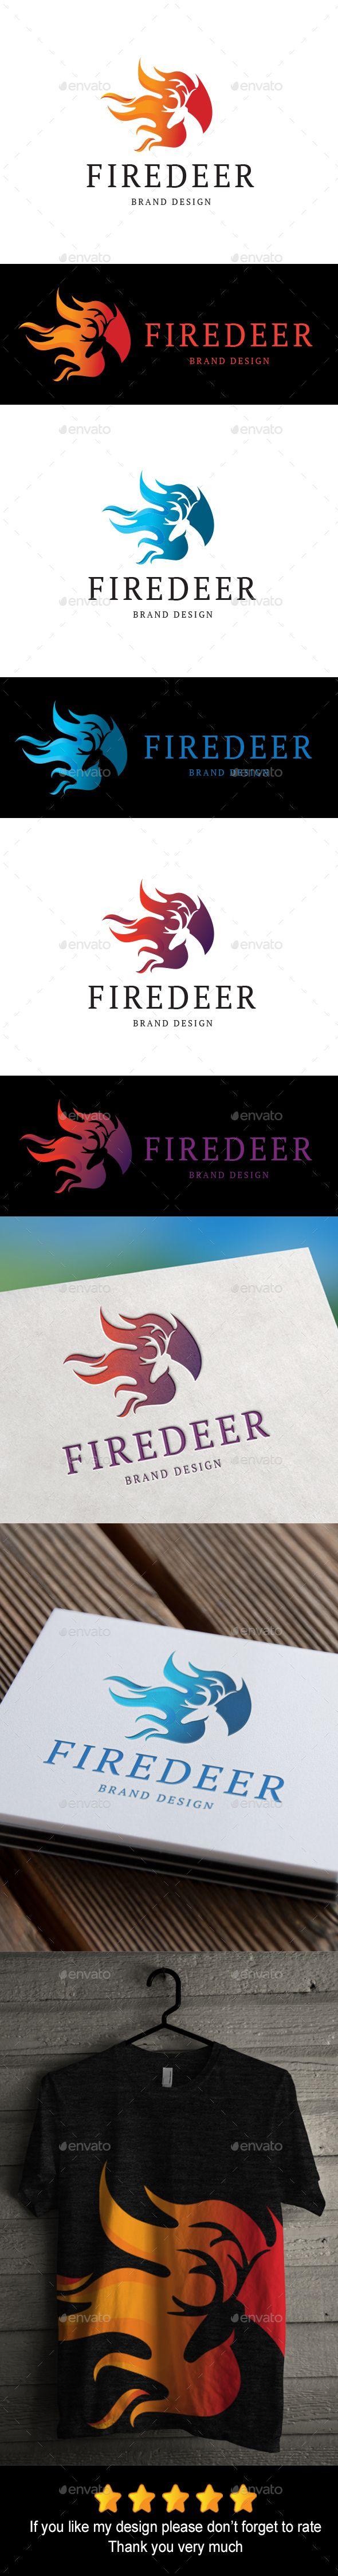 Firedeer Logo Template Vector EPS, AI. Download here: http://graphicriver.net/item/firedeer-logo/15715817?ref=ksioks